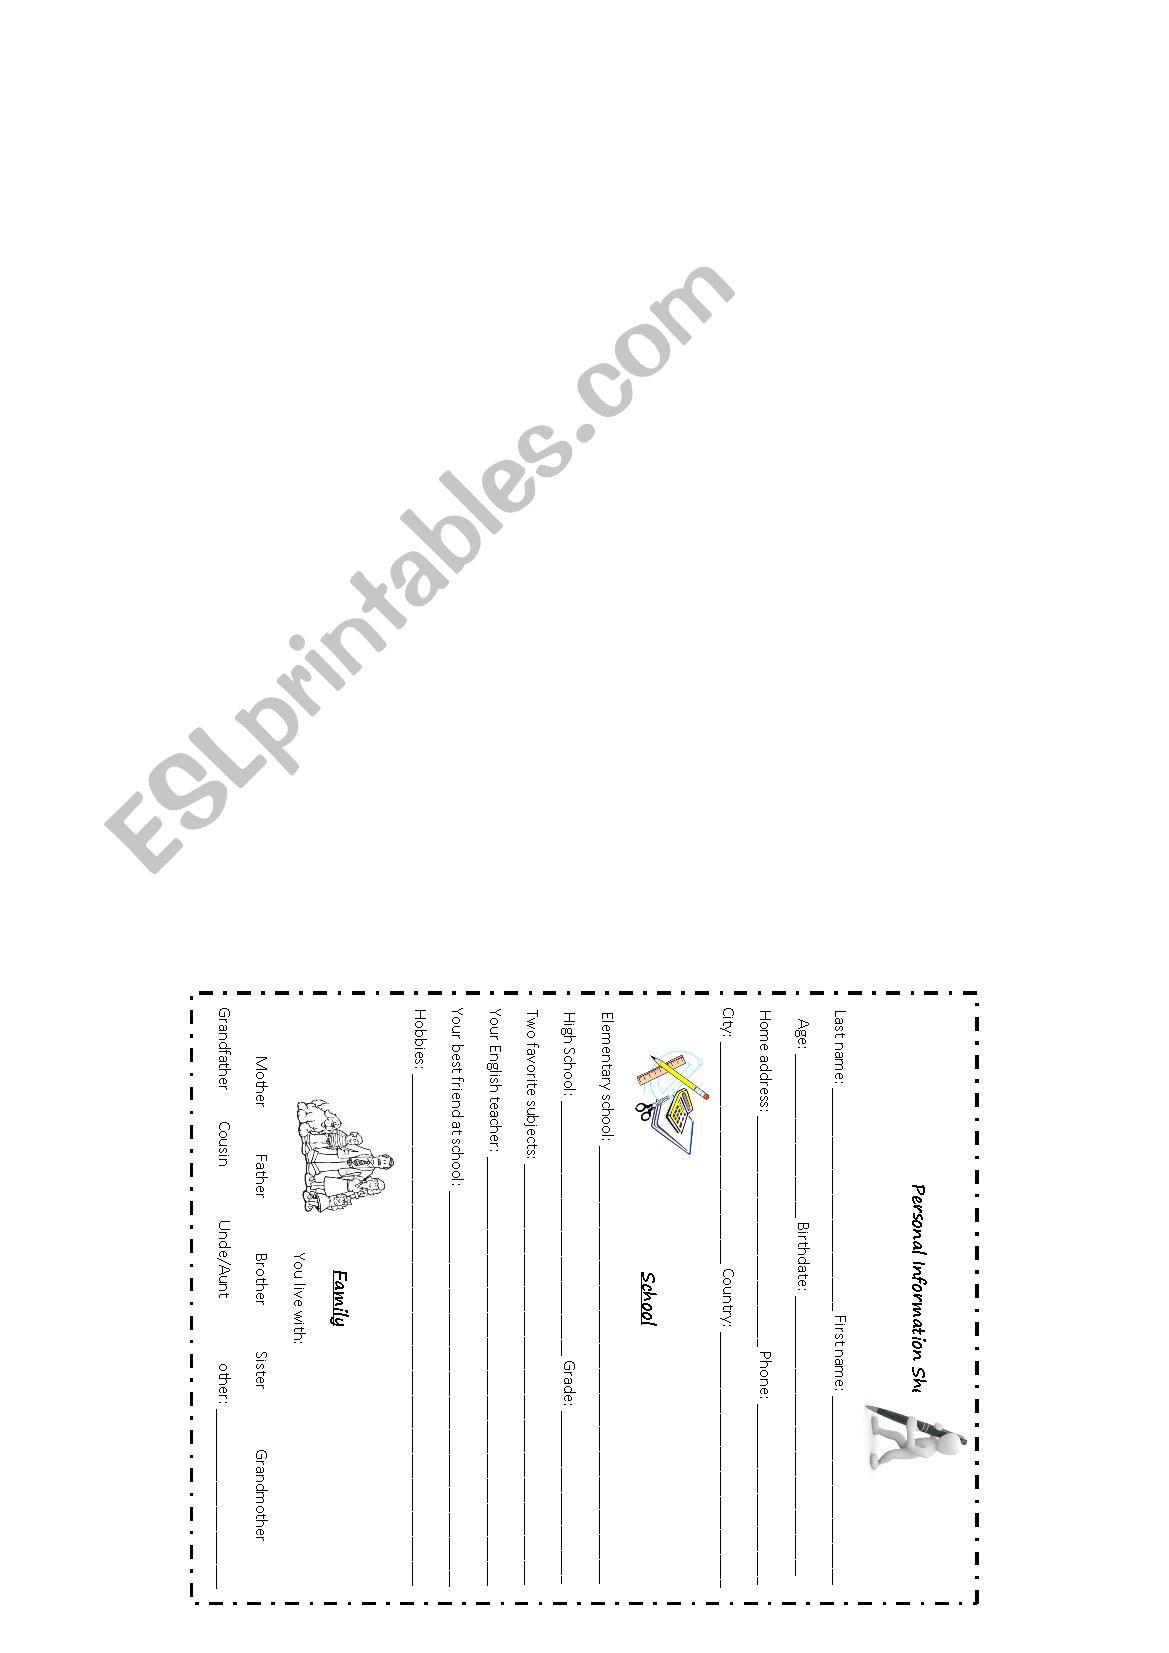 Personal Information Sheet